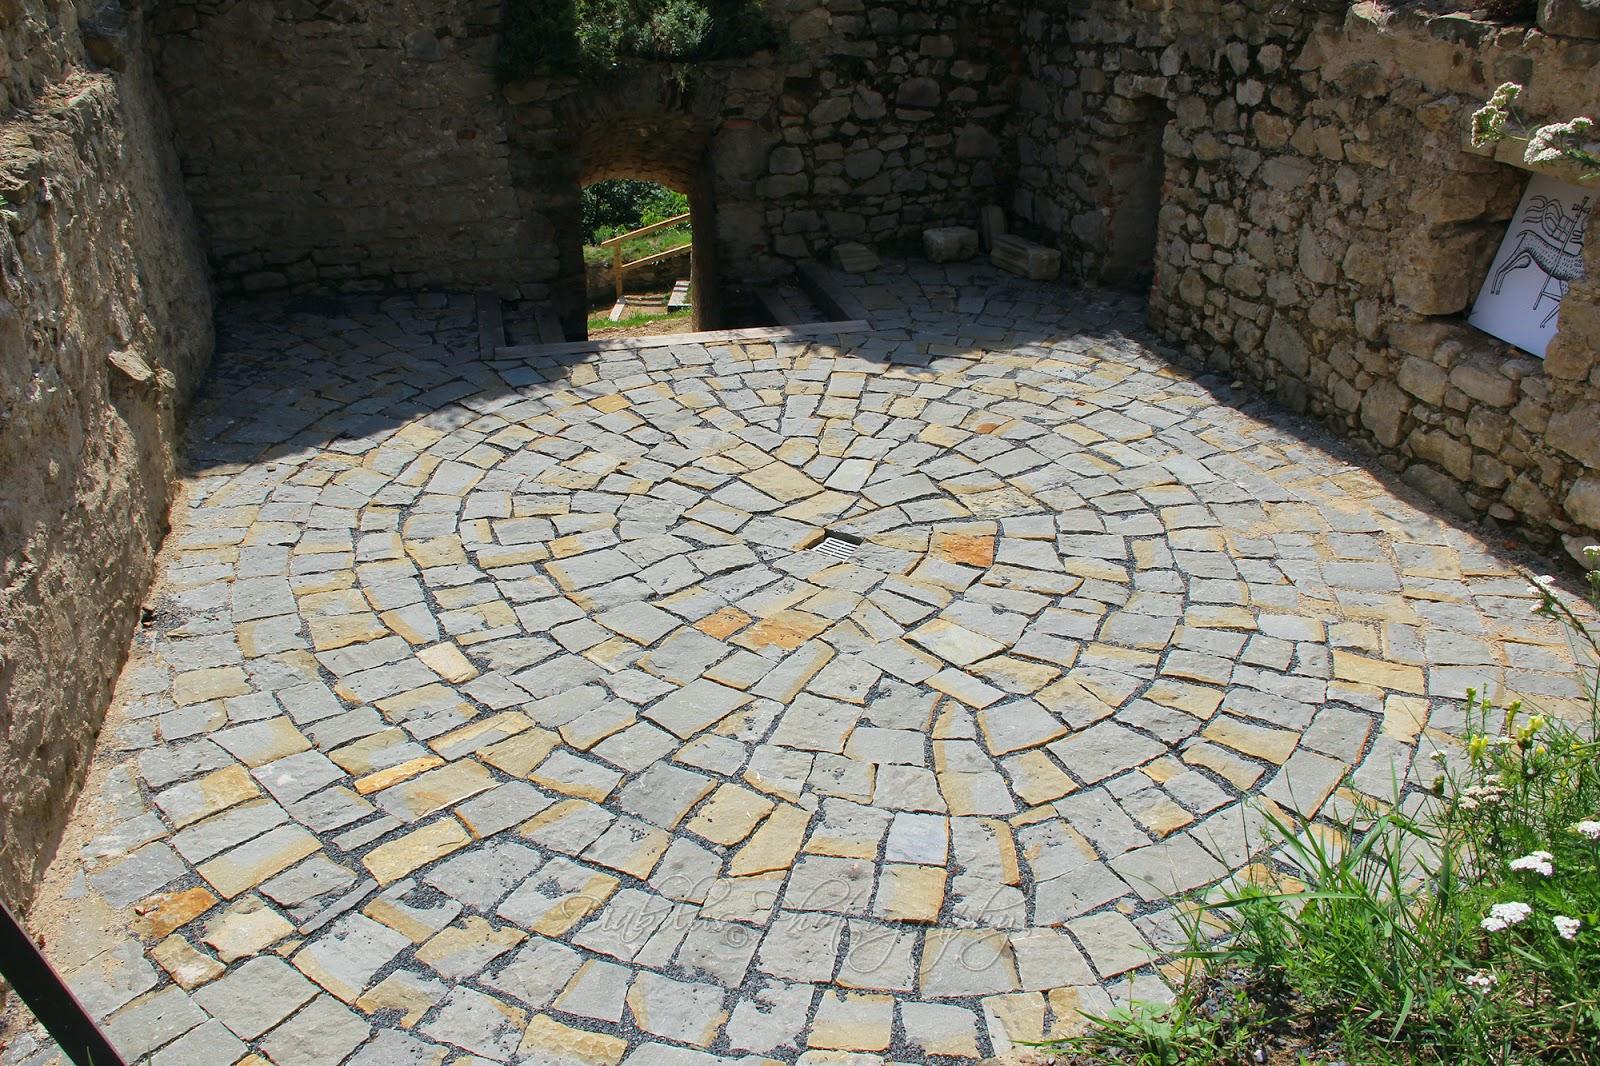 Kamenná mozaika/The Stone Mosaic